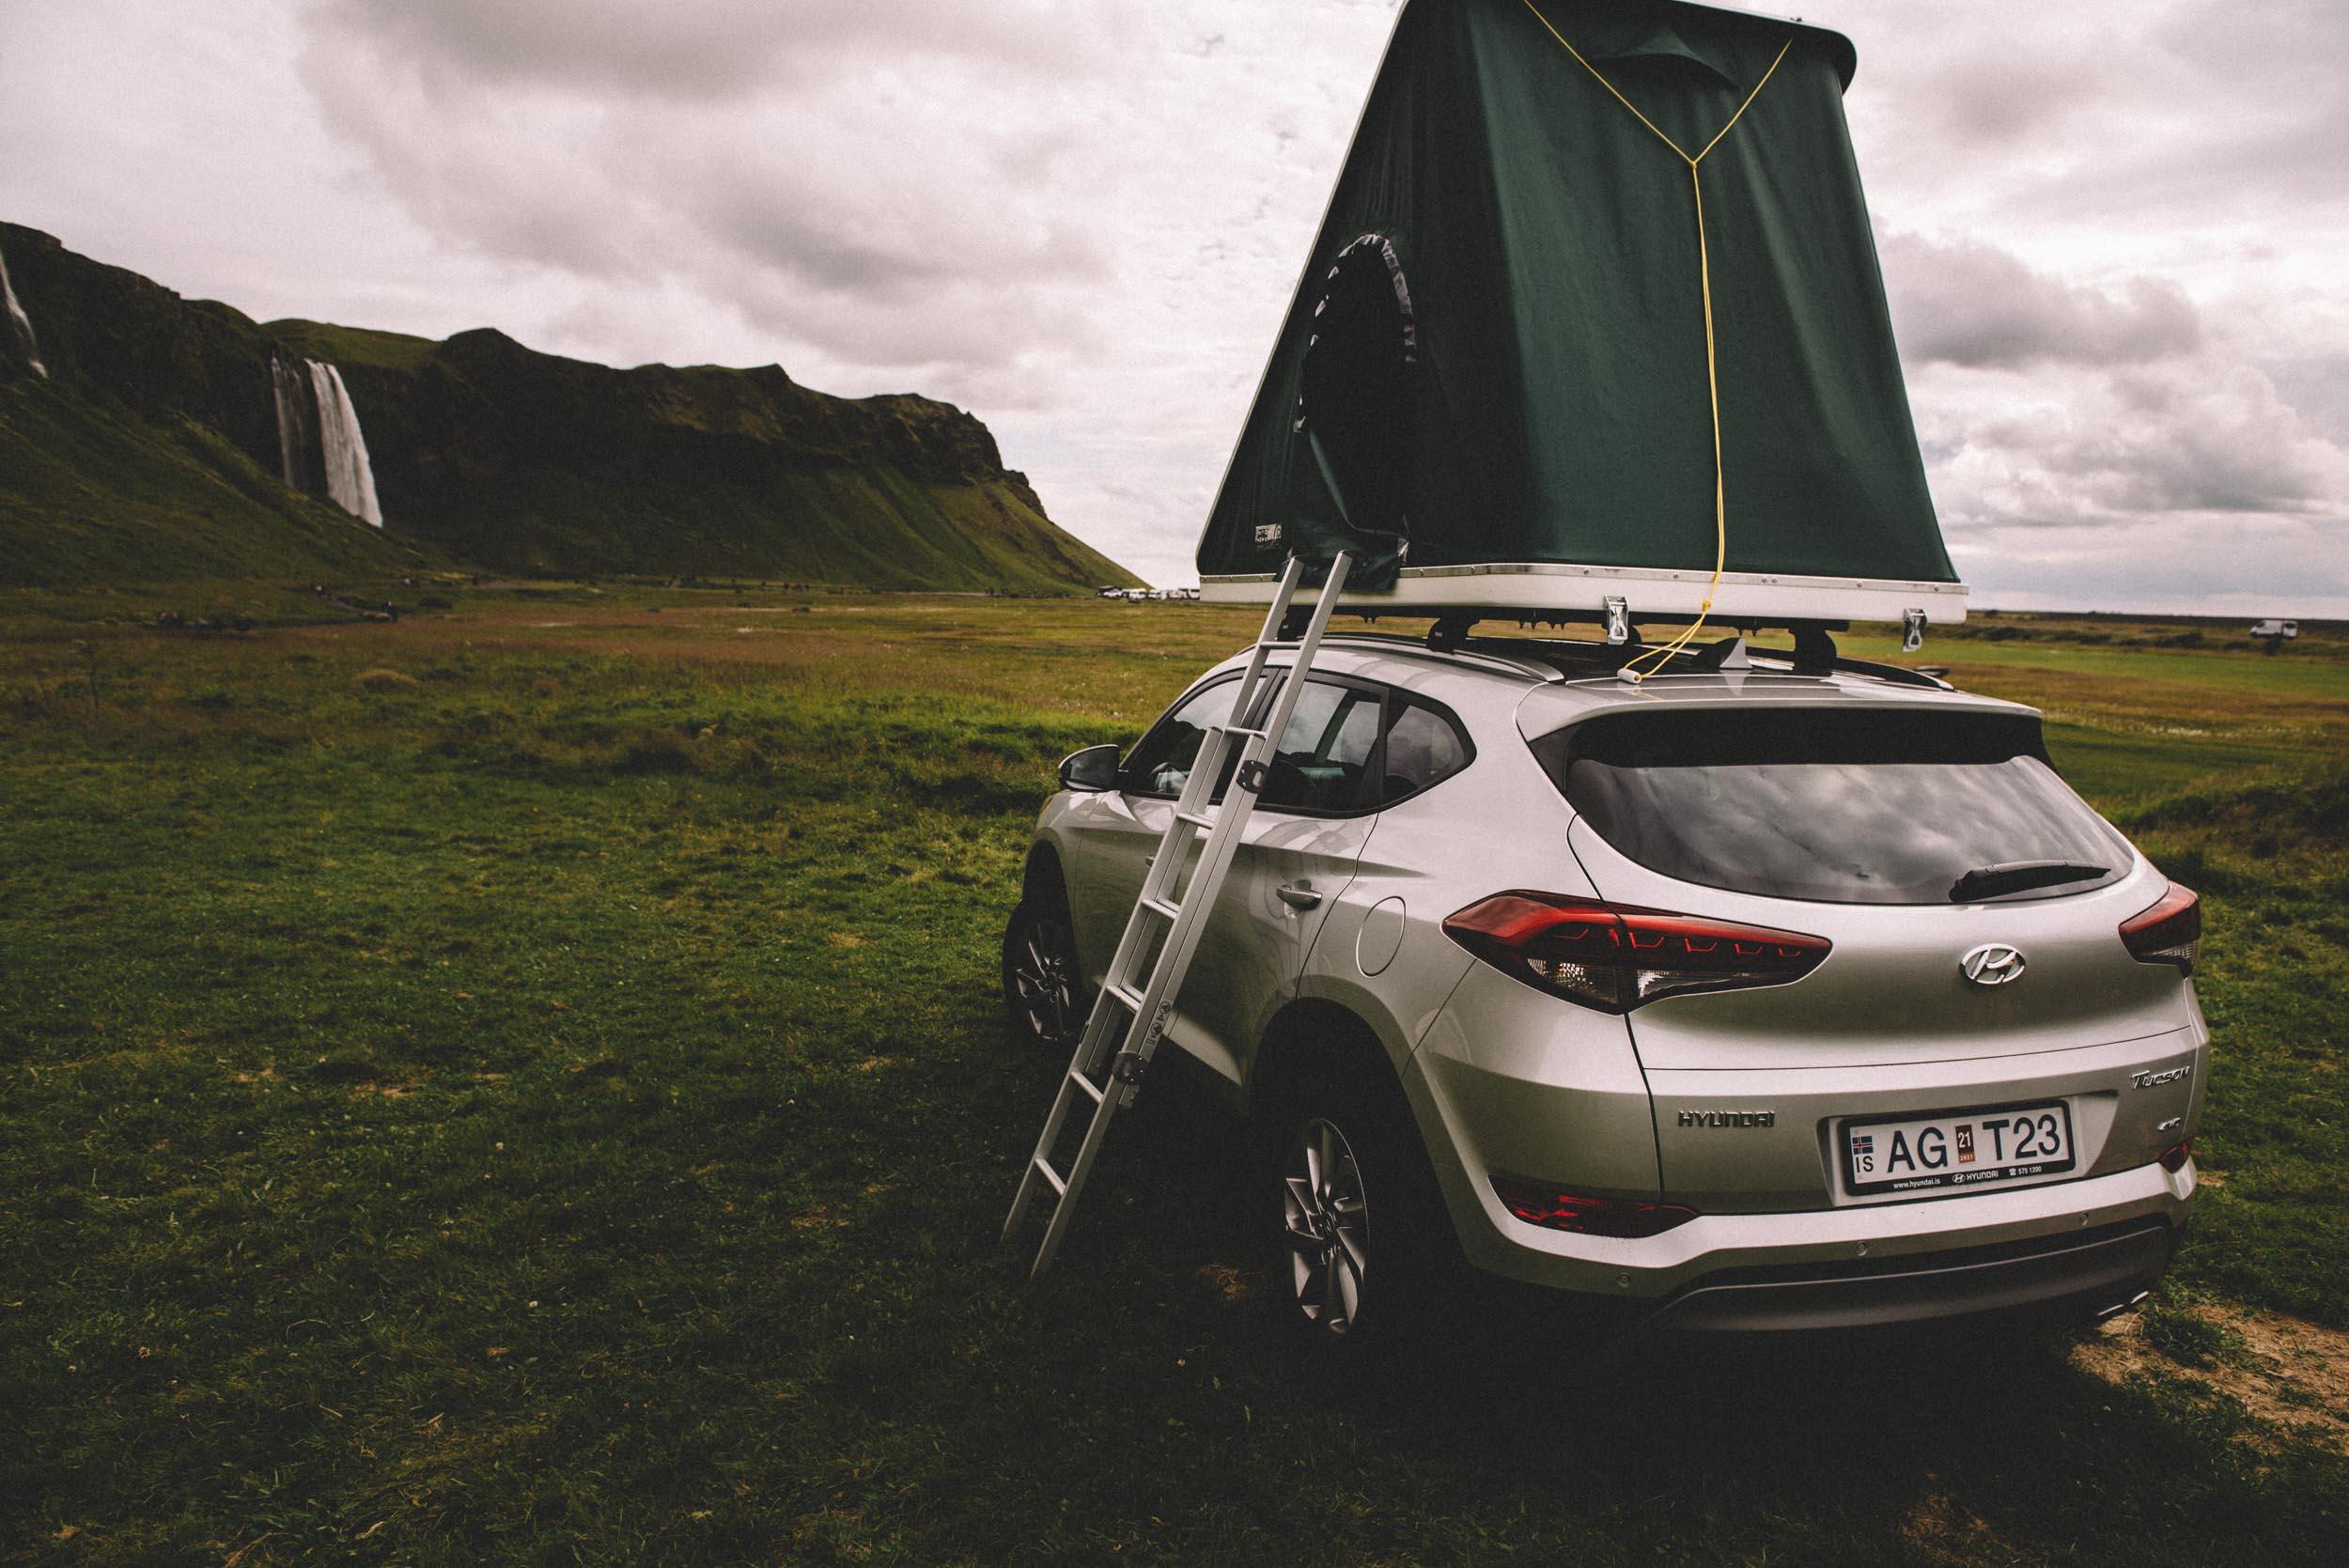 Iceland-trip-10.jpg